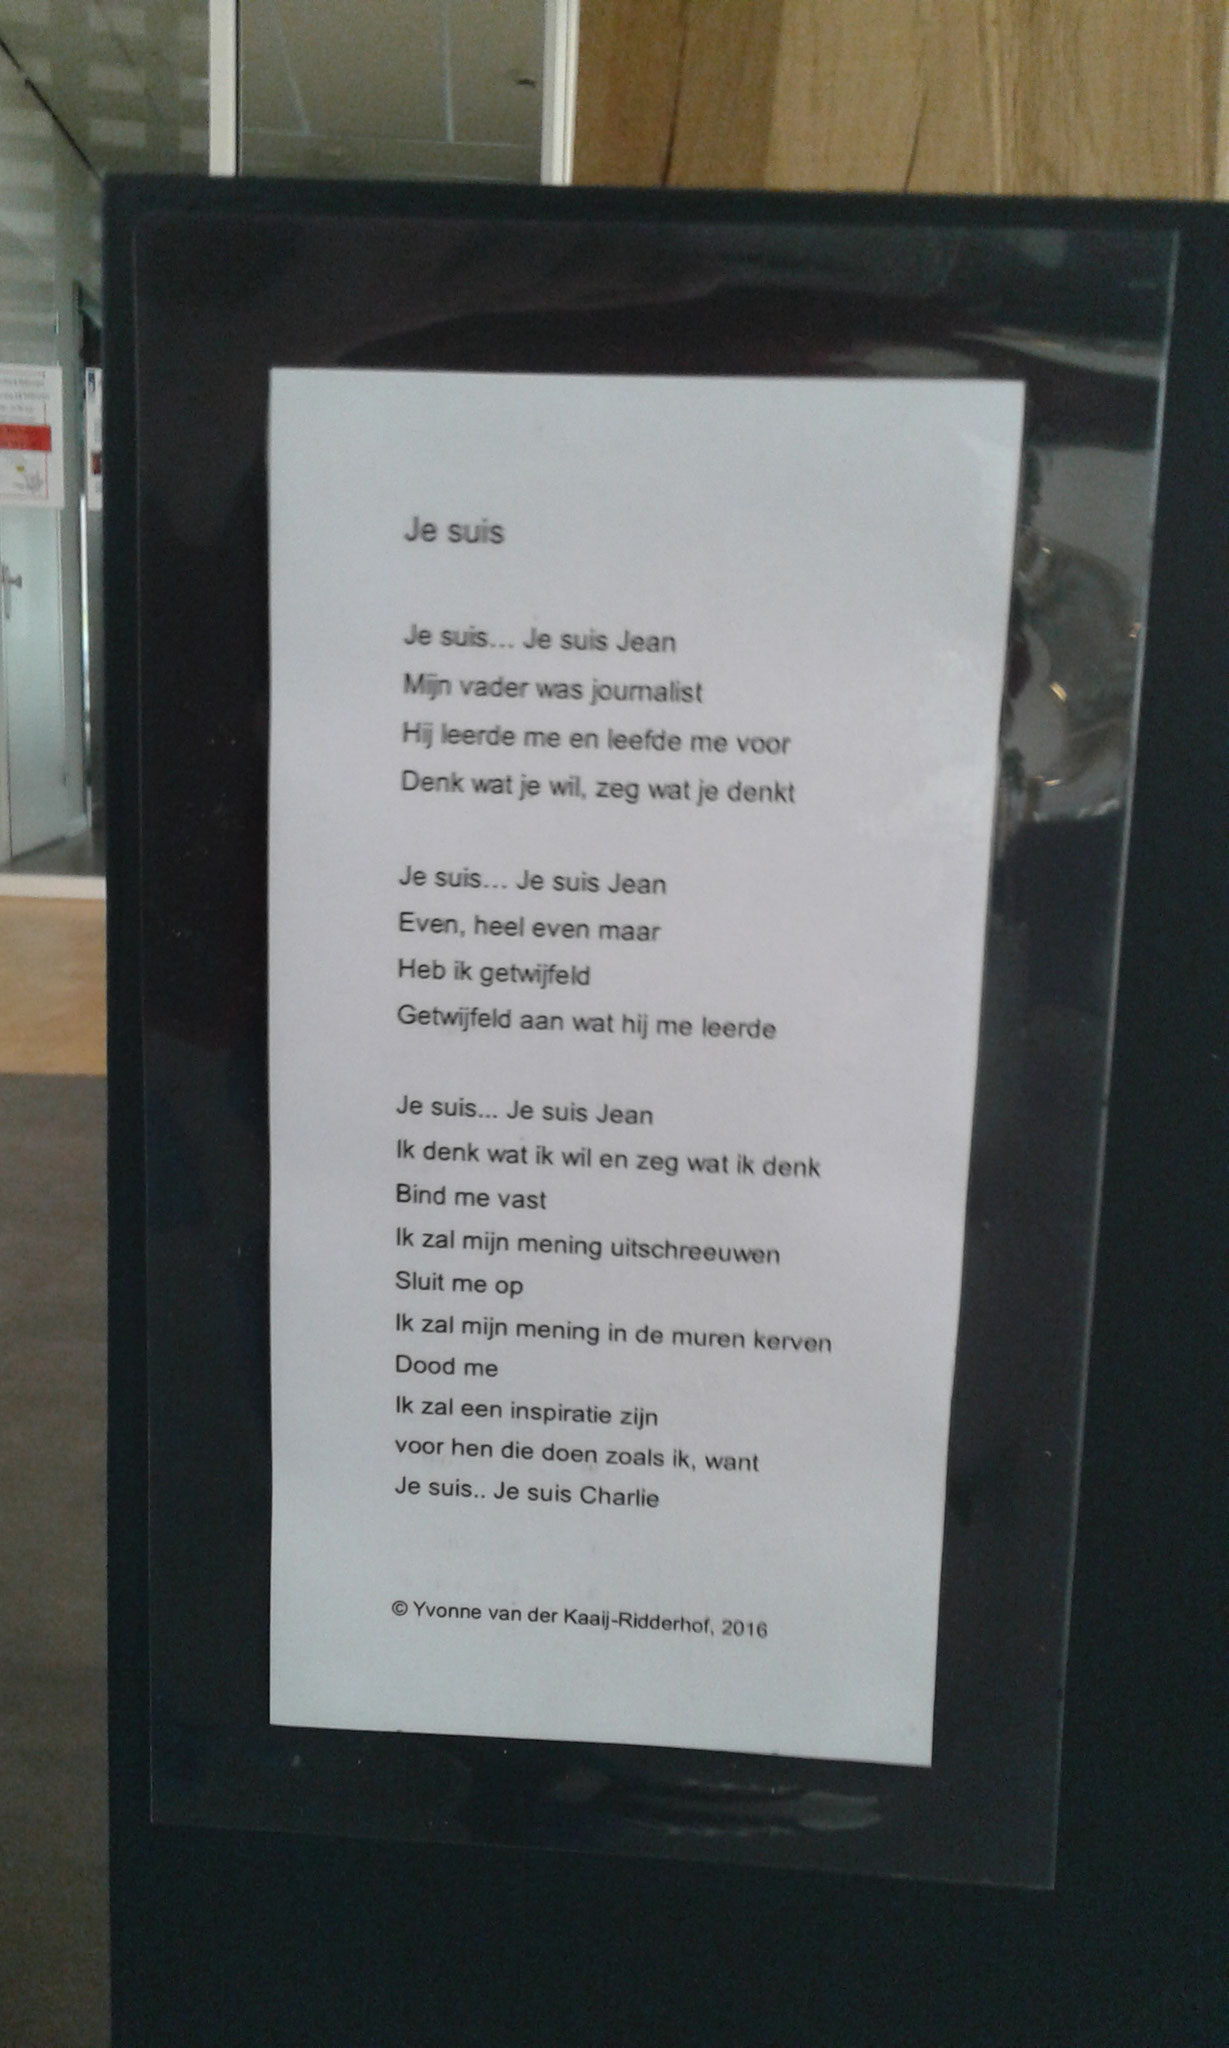 Gedicht (Y.v.d. Kaaij)  bij 'Je suis Charlie'